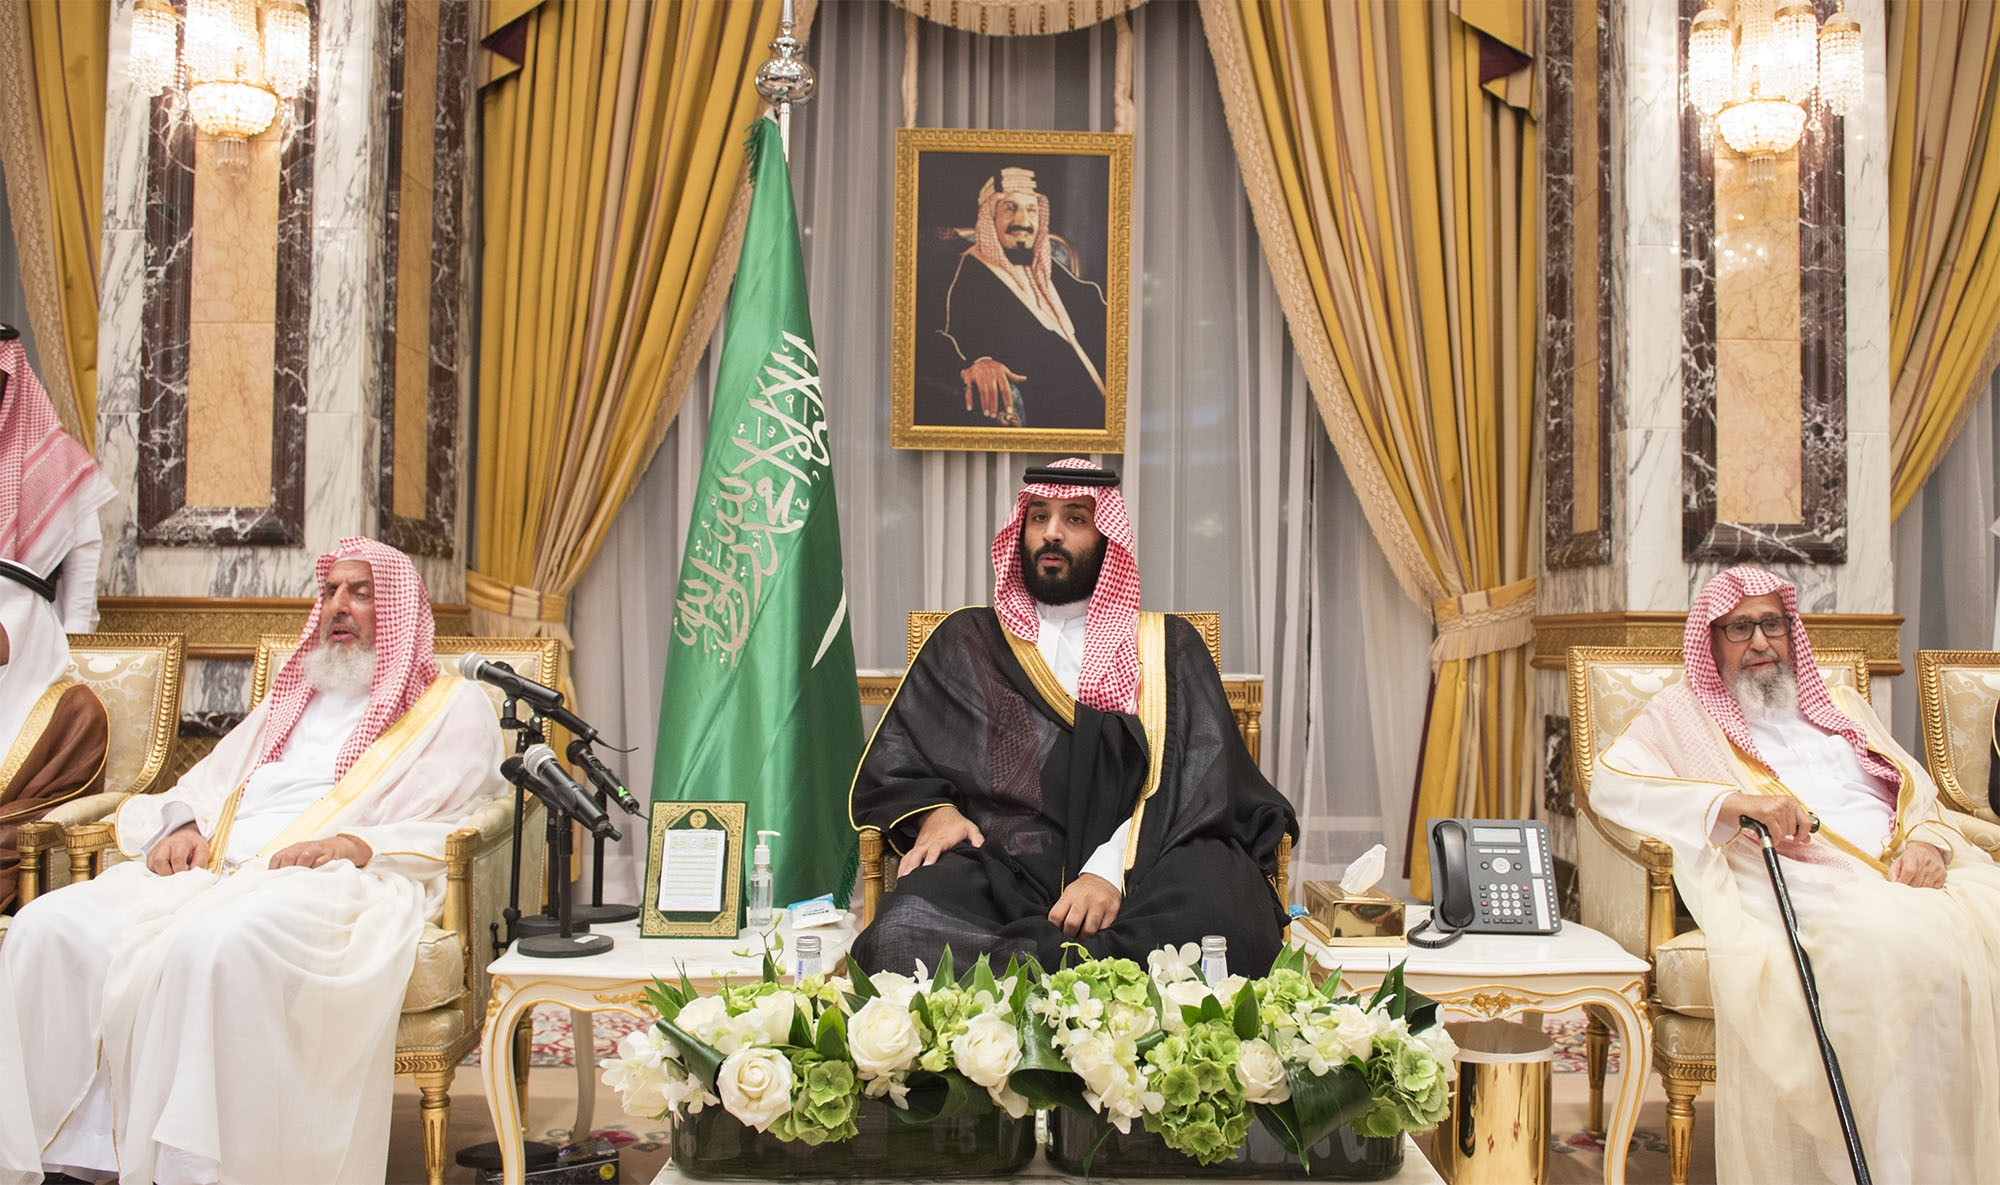 New Saudi crown prince Mohammad bin Salman al-Saud